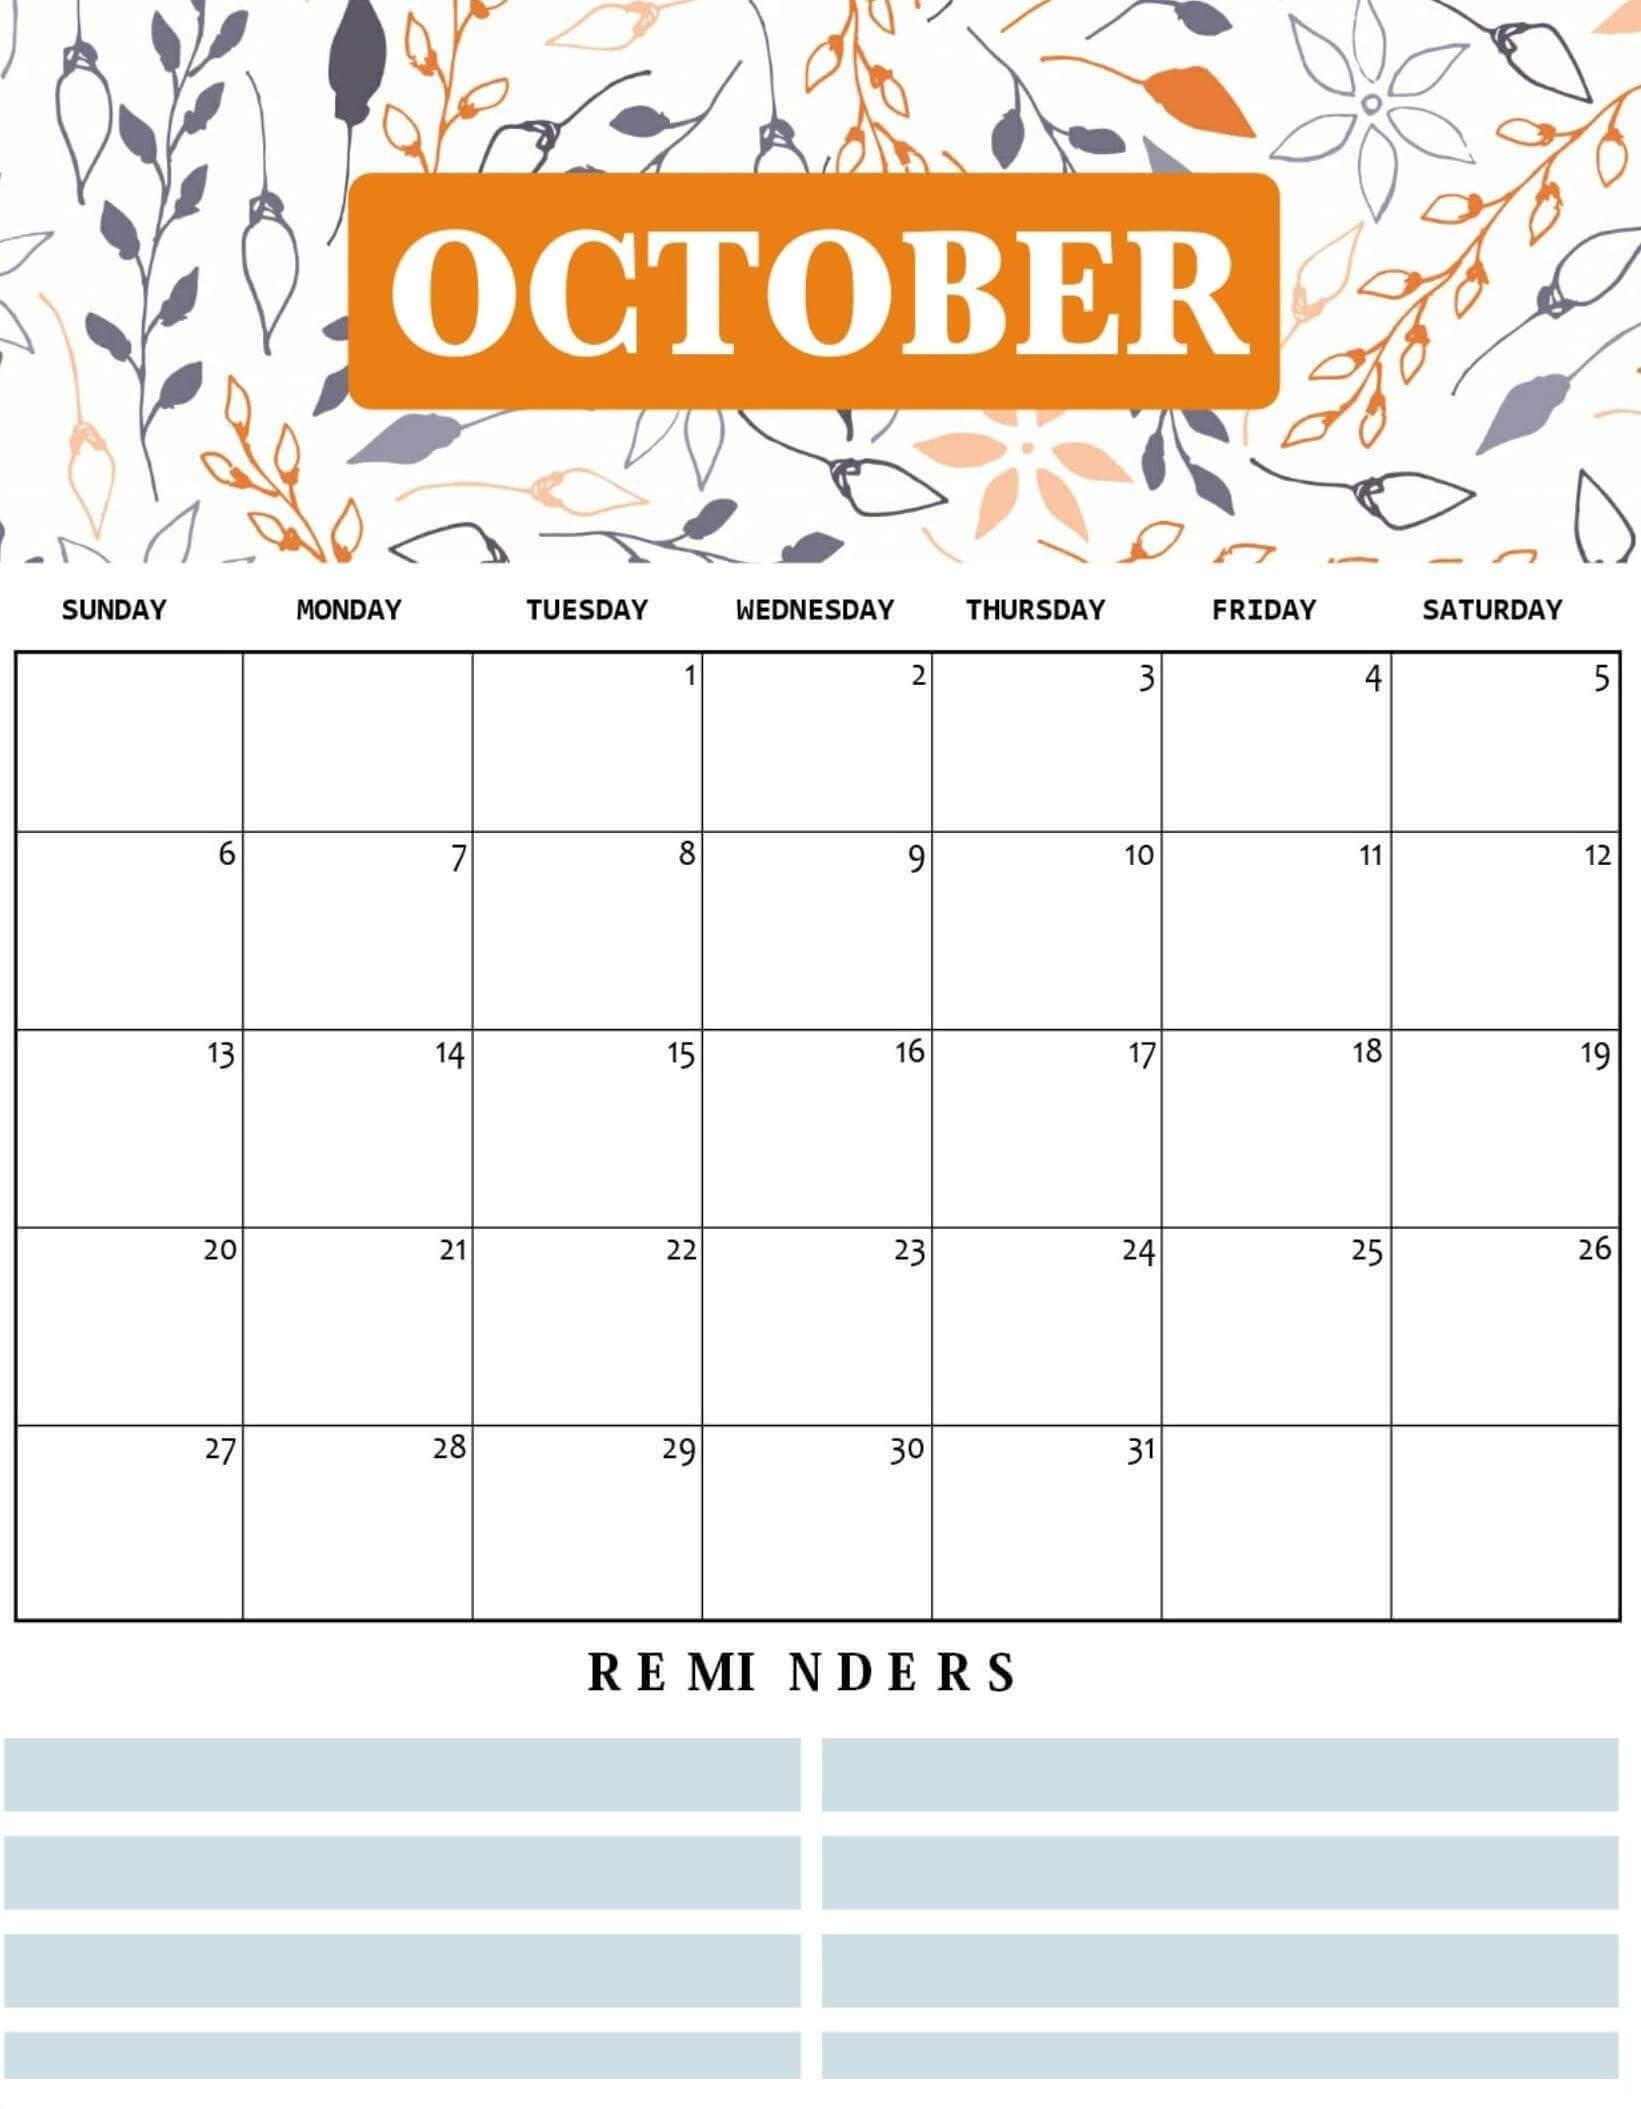 Cute October 2020 Floral Wall Calendar